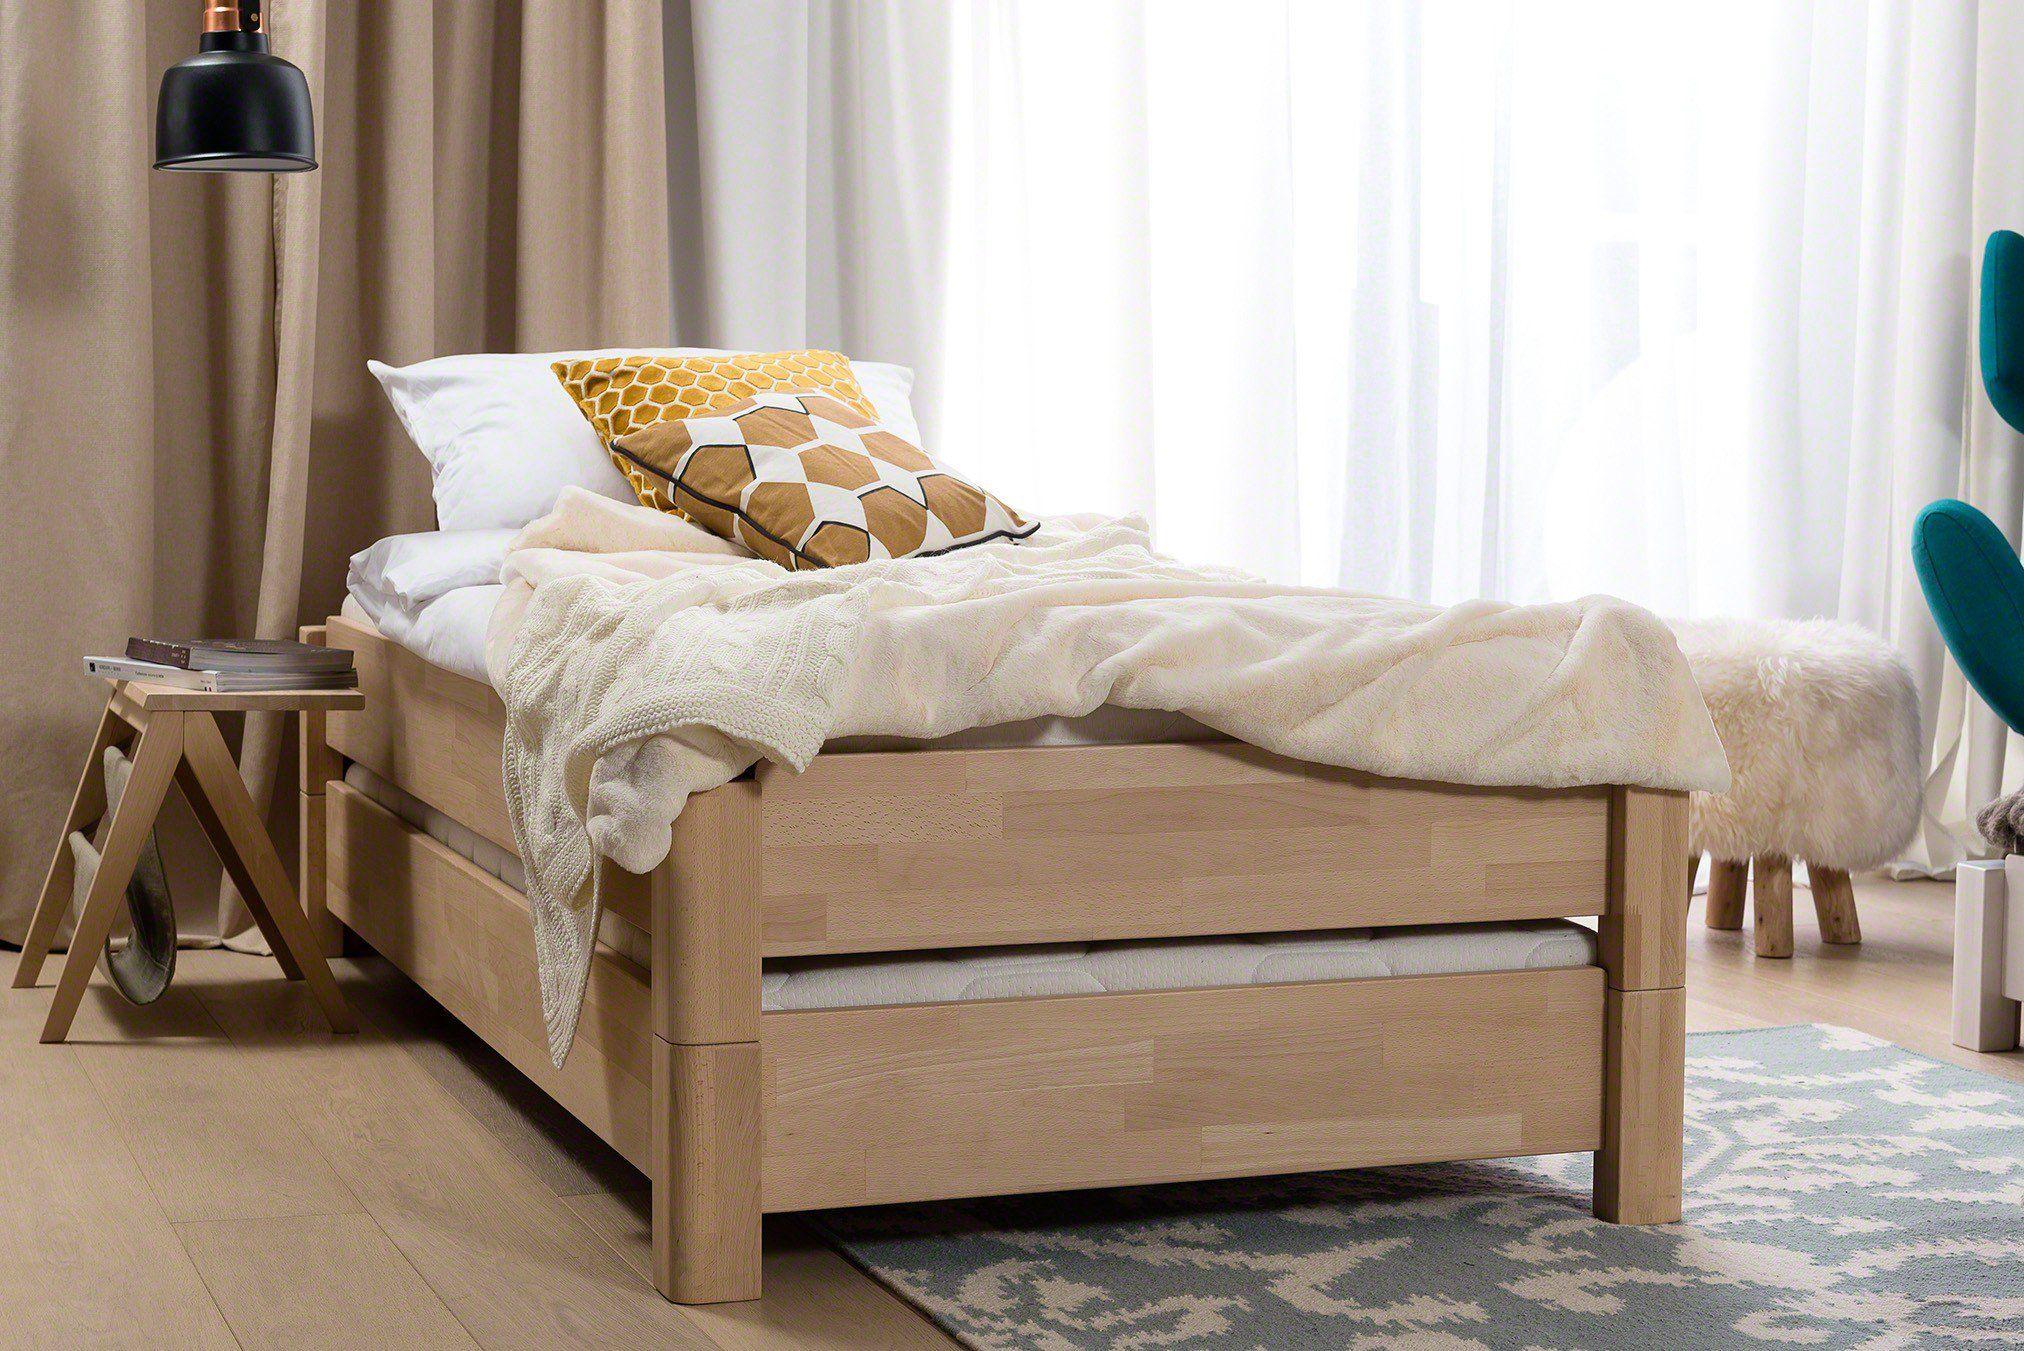 Stapelbett von Dico Buchenholz natur geölt Möbel Letz